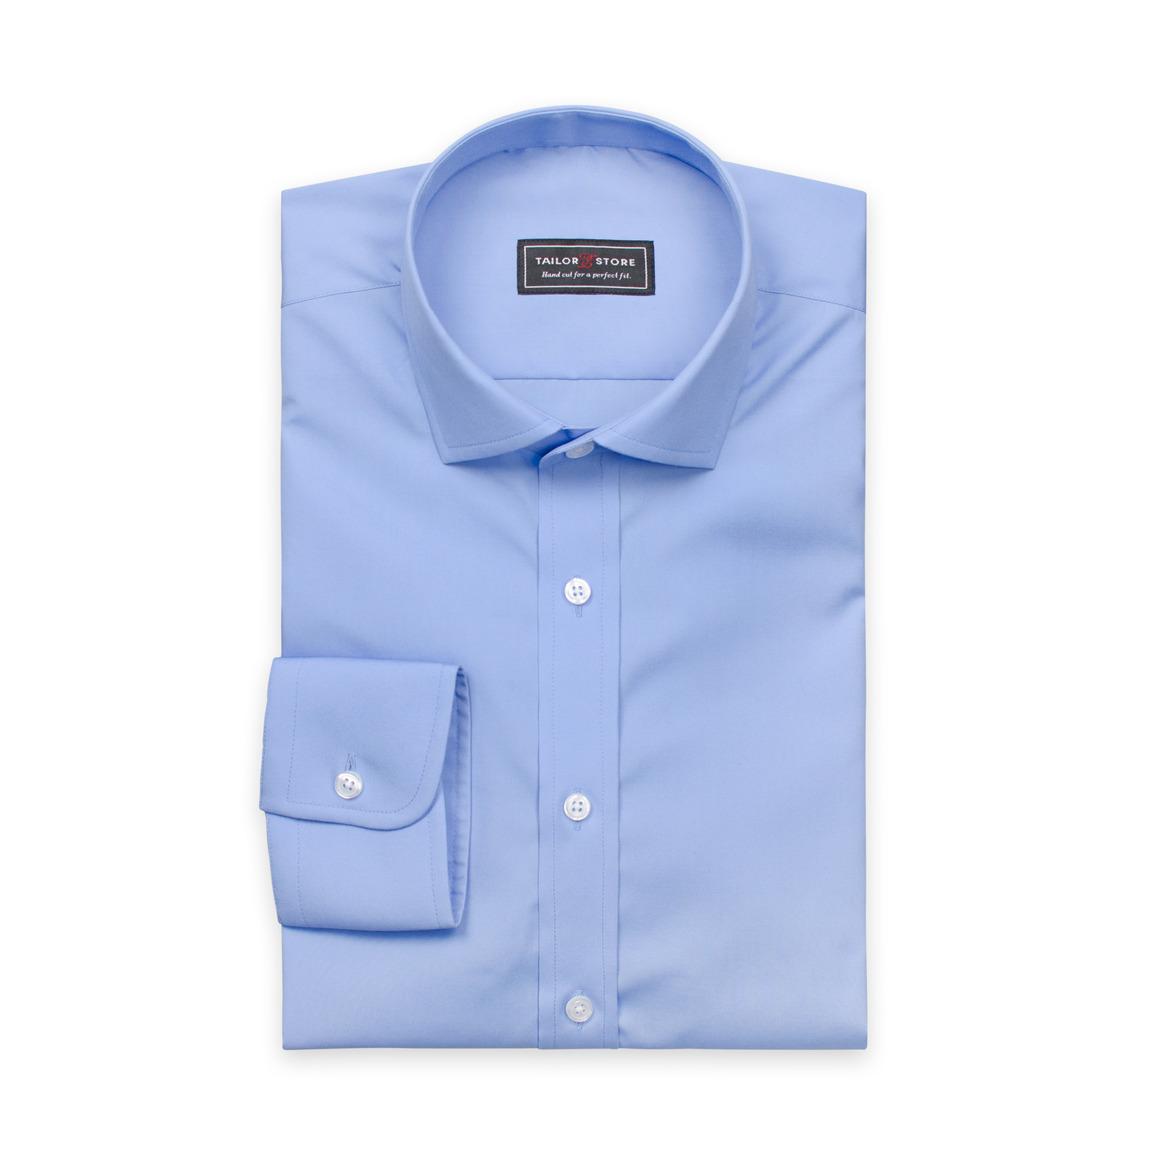 Blå poplinskjorta med cut-away modern krage